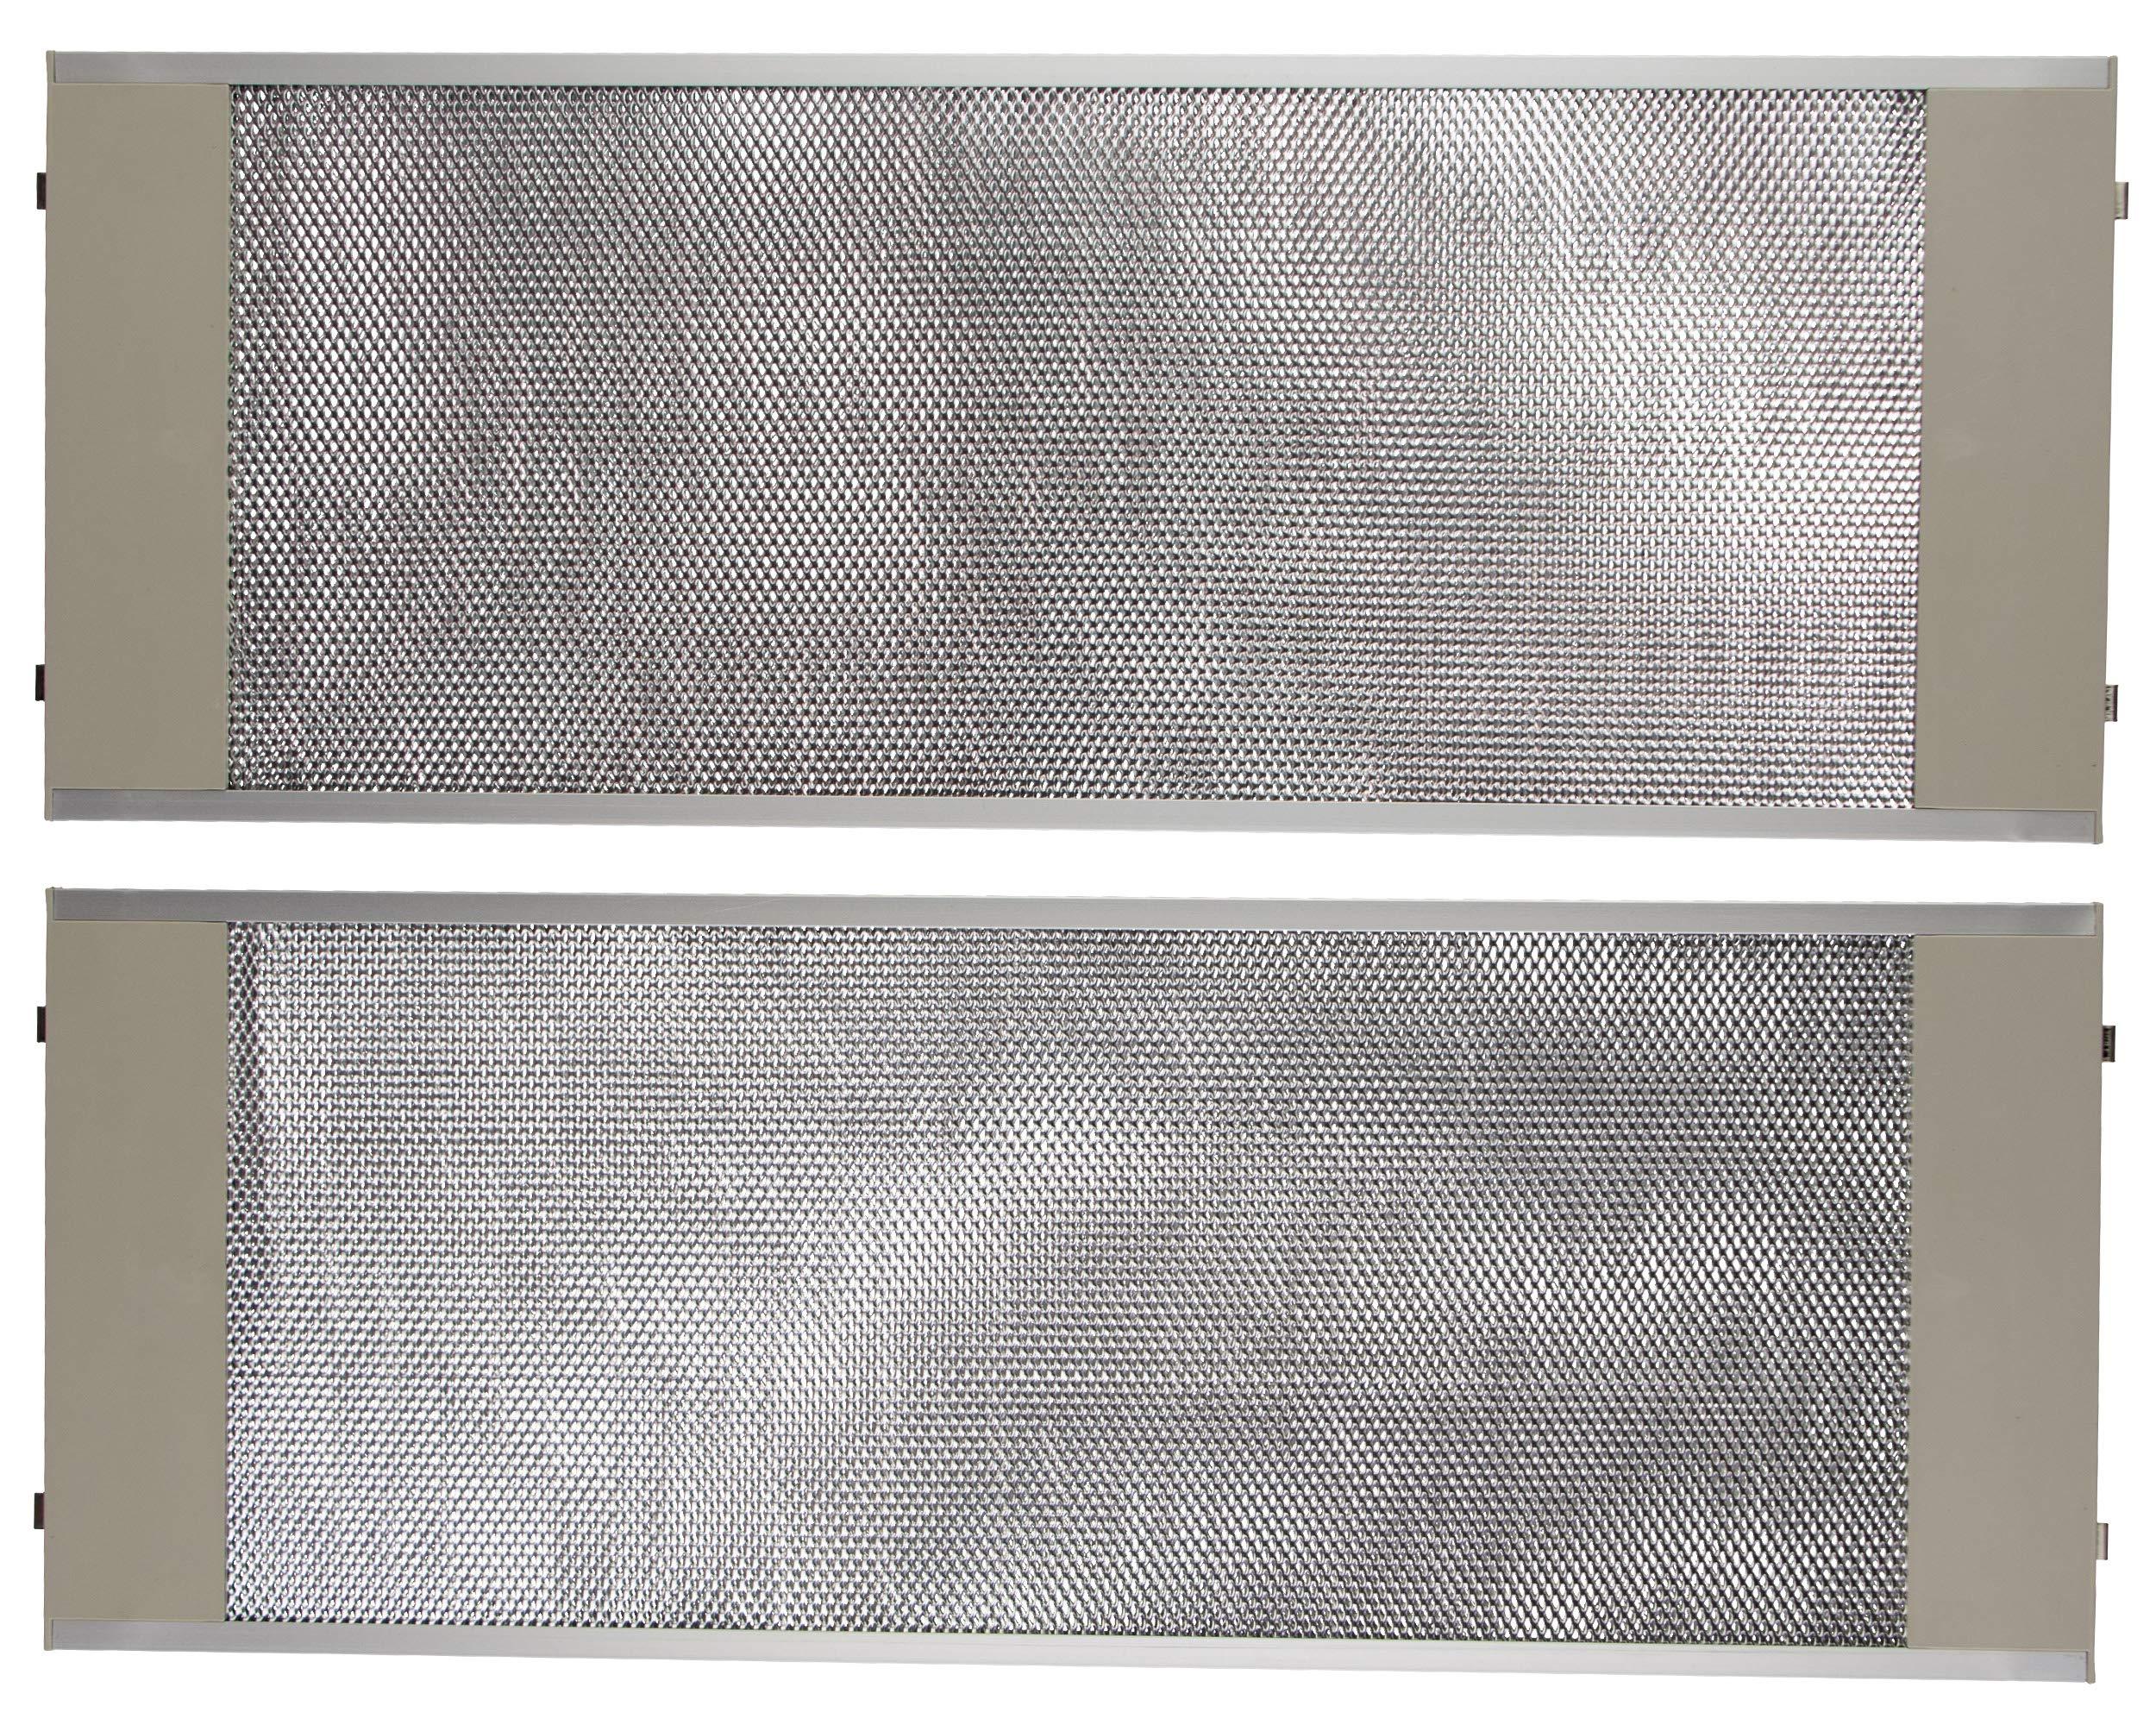 Remle - Filtro metalico campana extractora Teka 19x50cm CNL2000 - Kit 2 unidades: Amazon.es: Grandes electrodomésticos